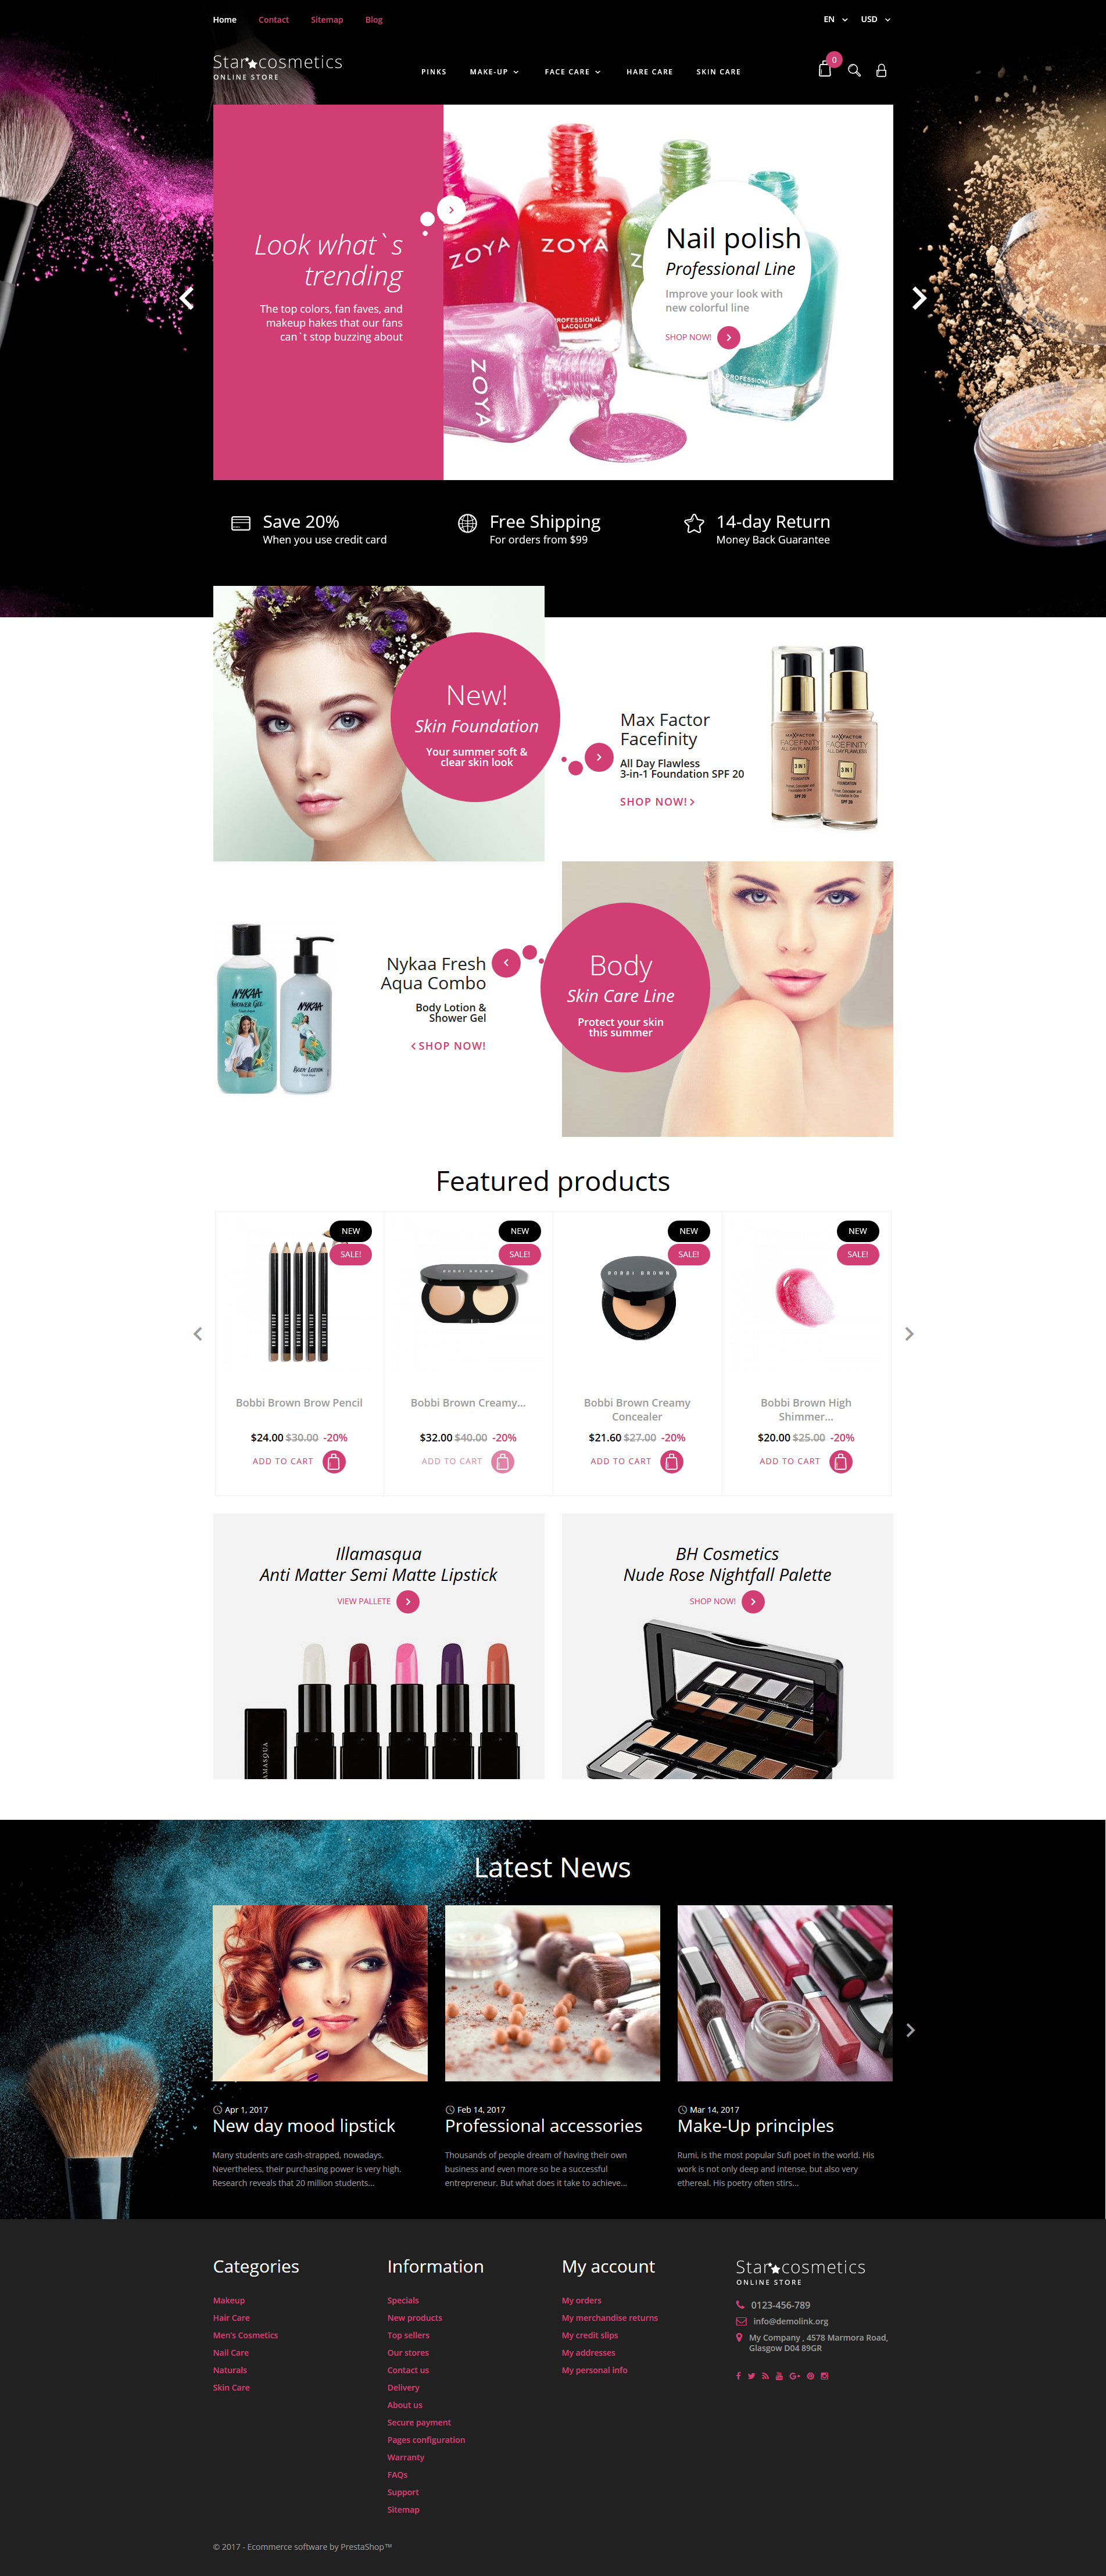 Star Cosmetics - Beauty Items Responsive Tema PrestaShop №63545 - screenshot